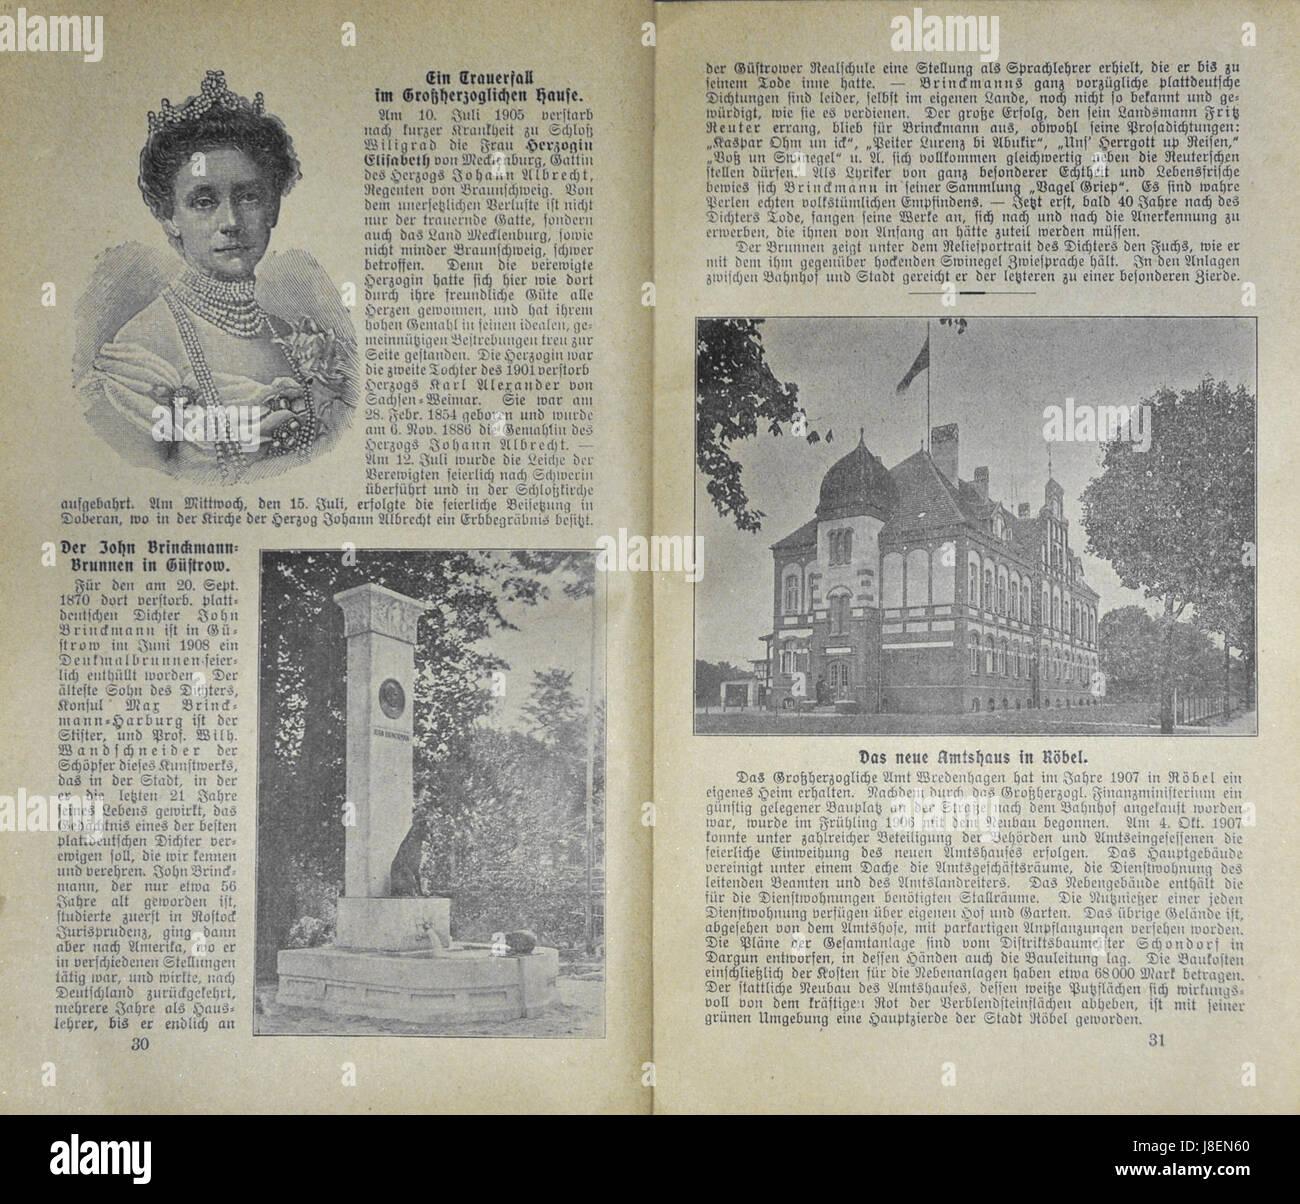 Mecklenburgischer Kalender 1909 028 Stock Photo